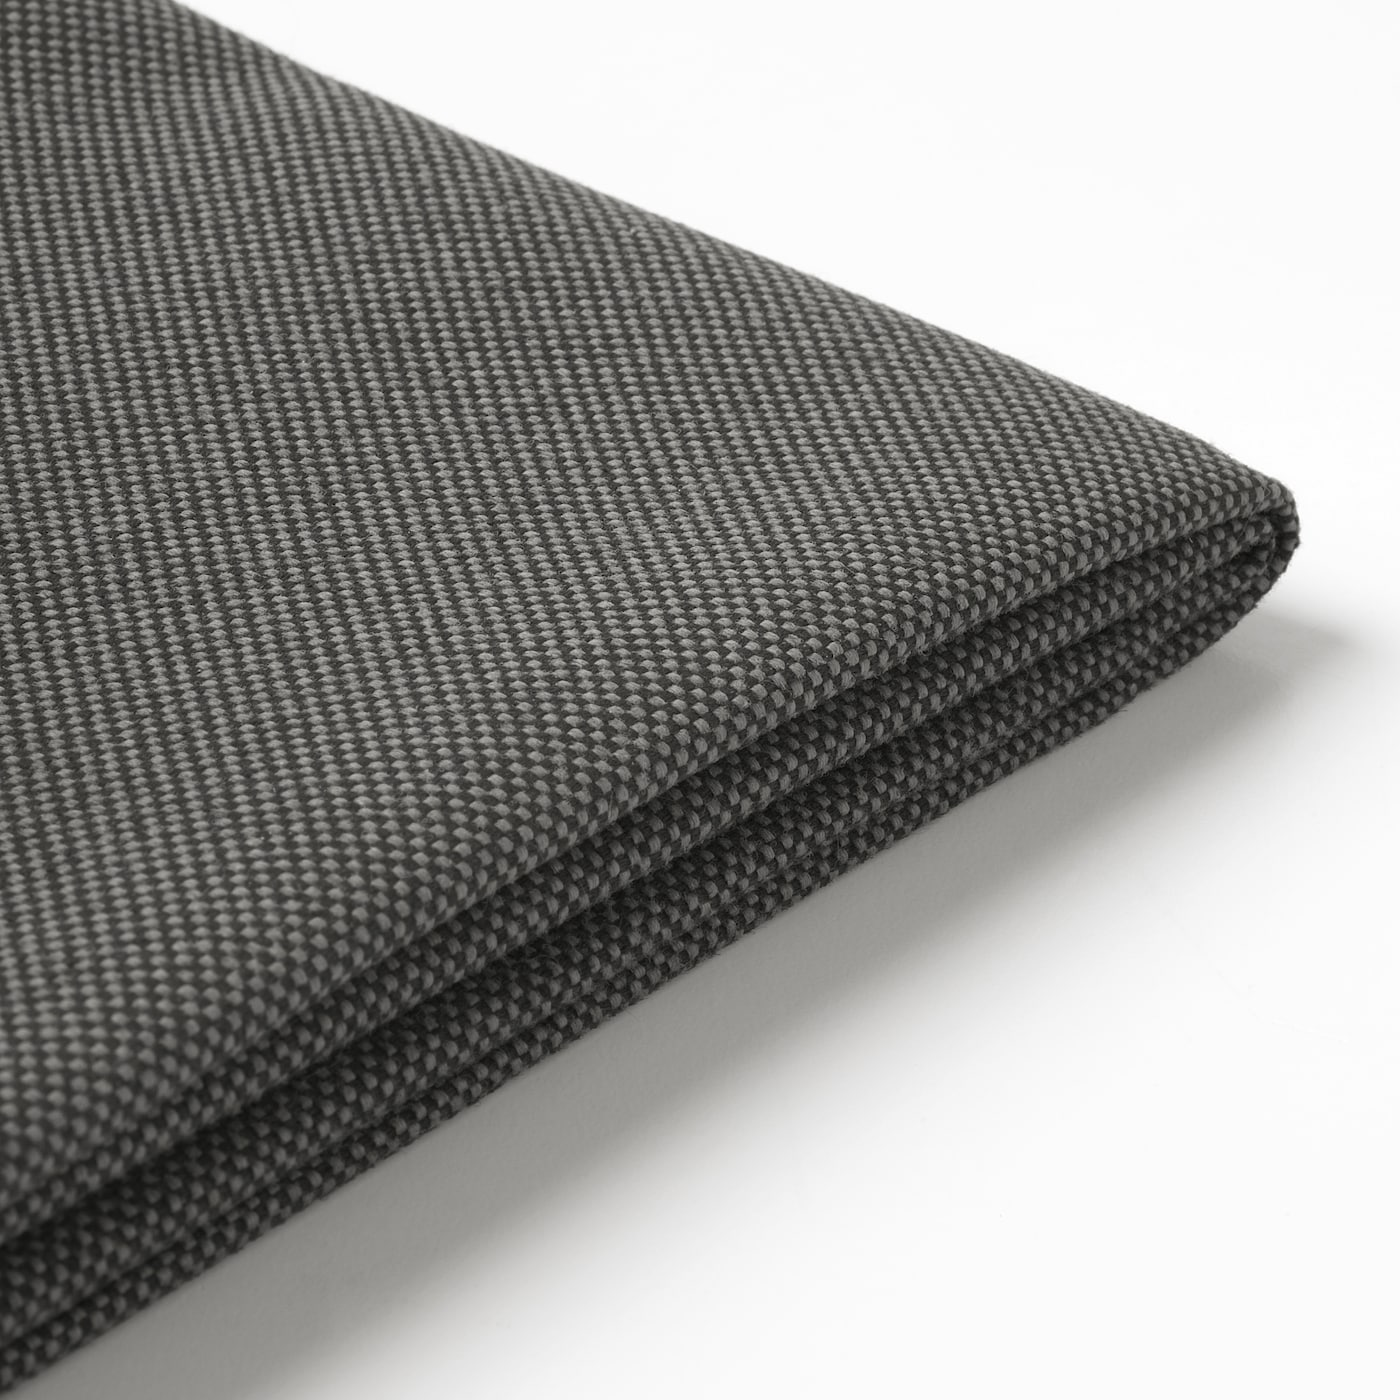 FRÖSÖN Trekk til sete-/ryggpute, utendørs mørk grå, 116x45 cm